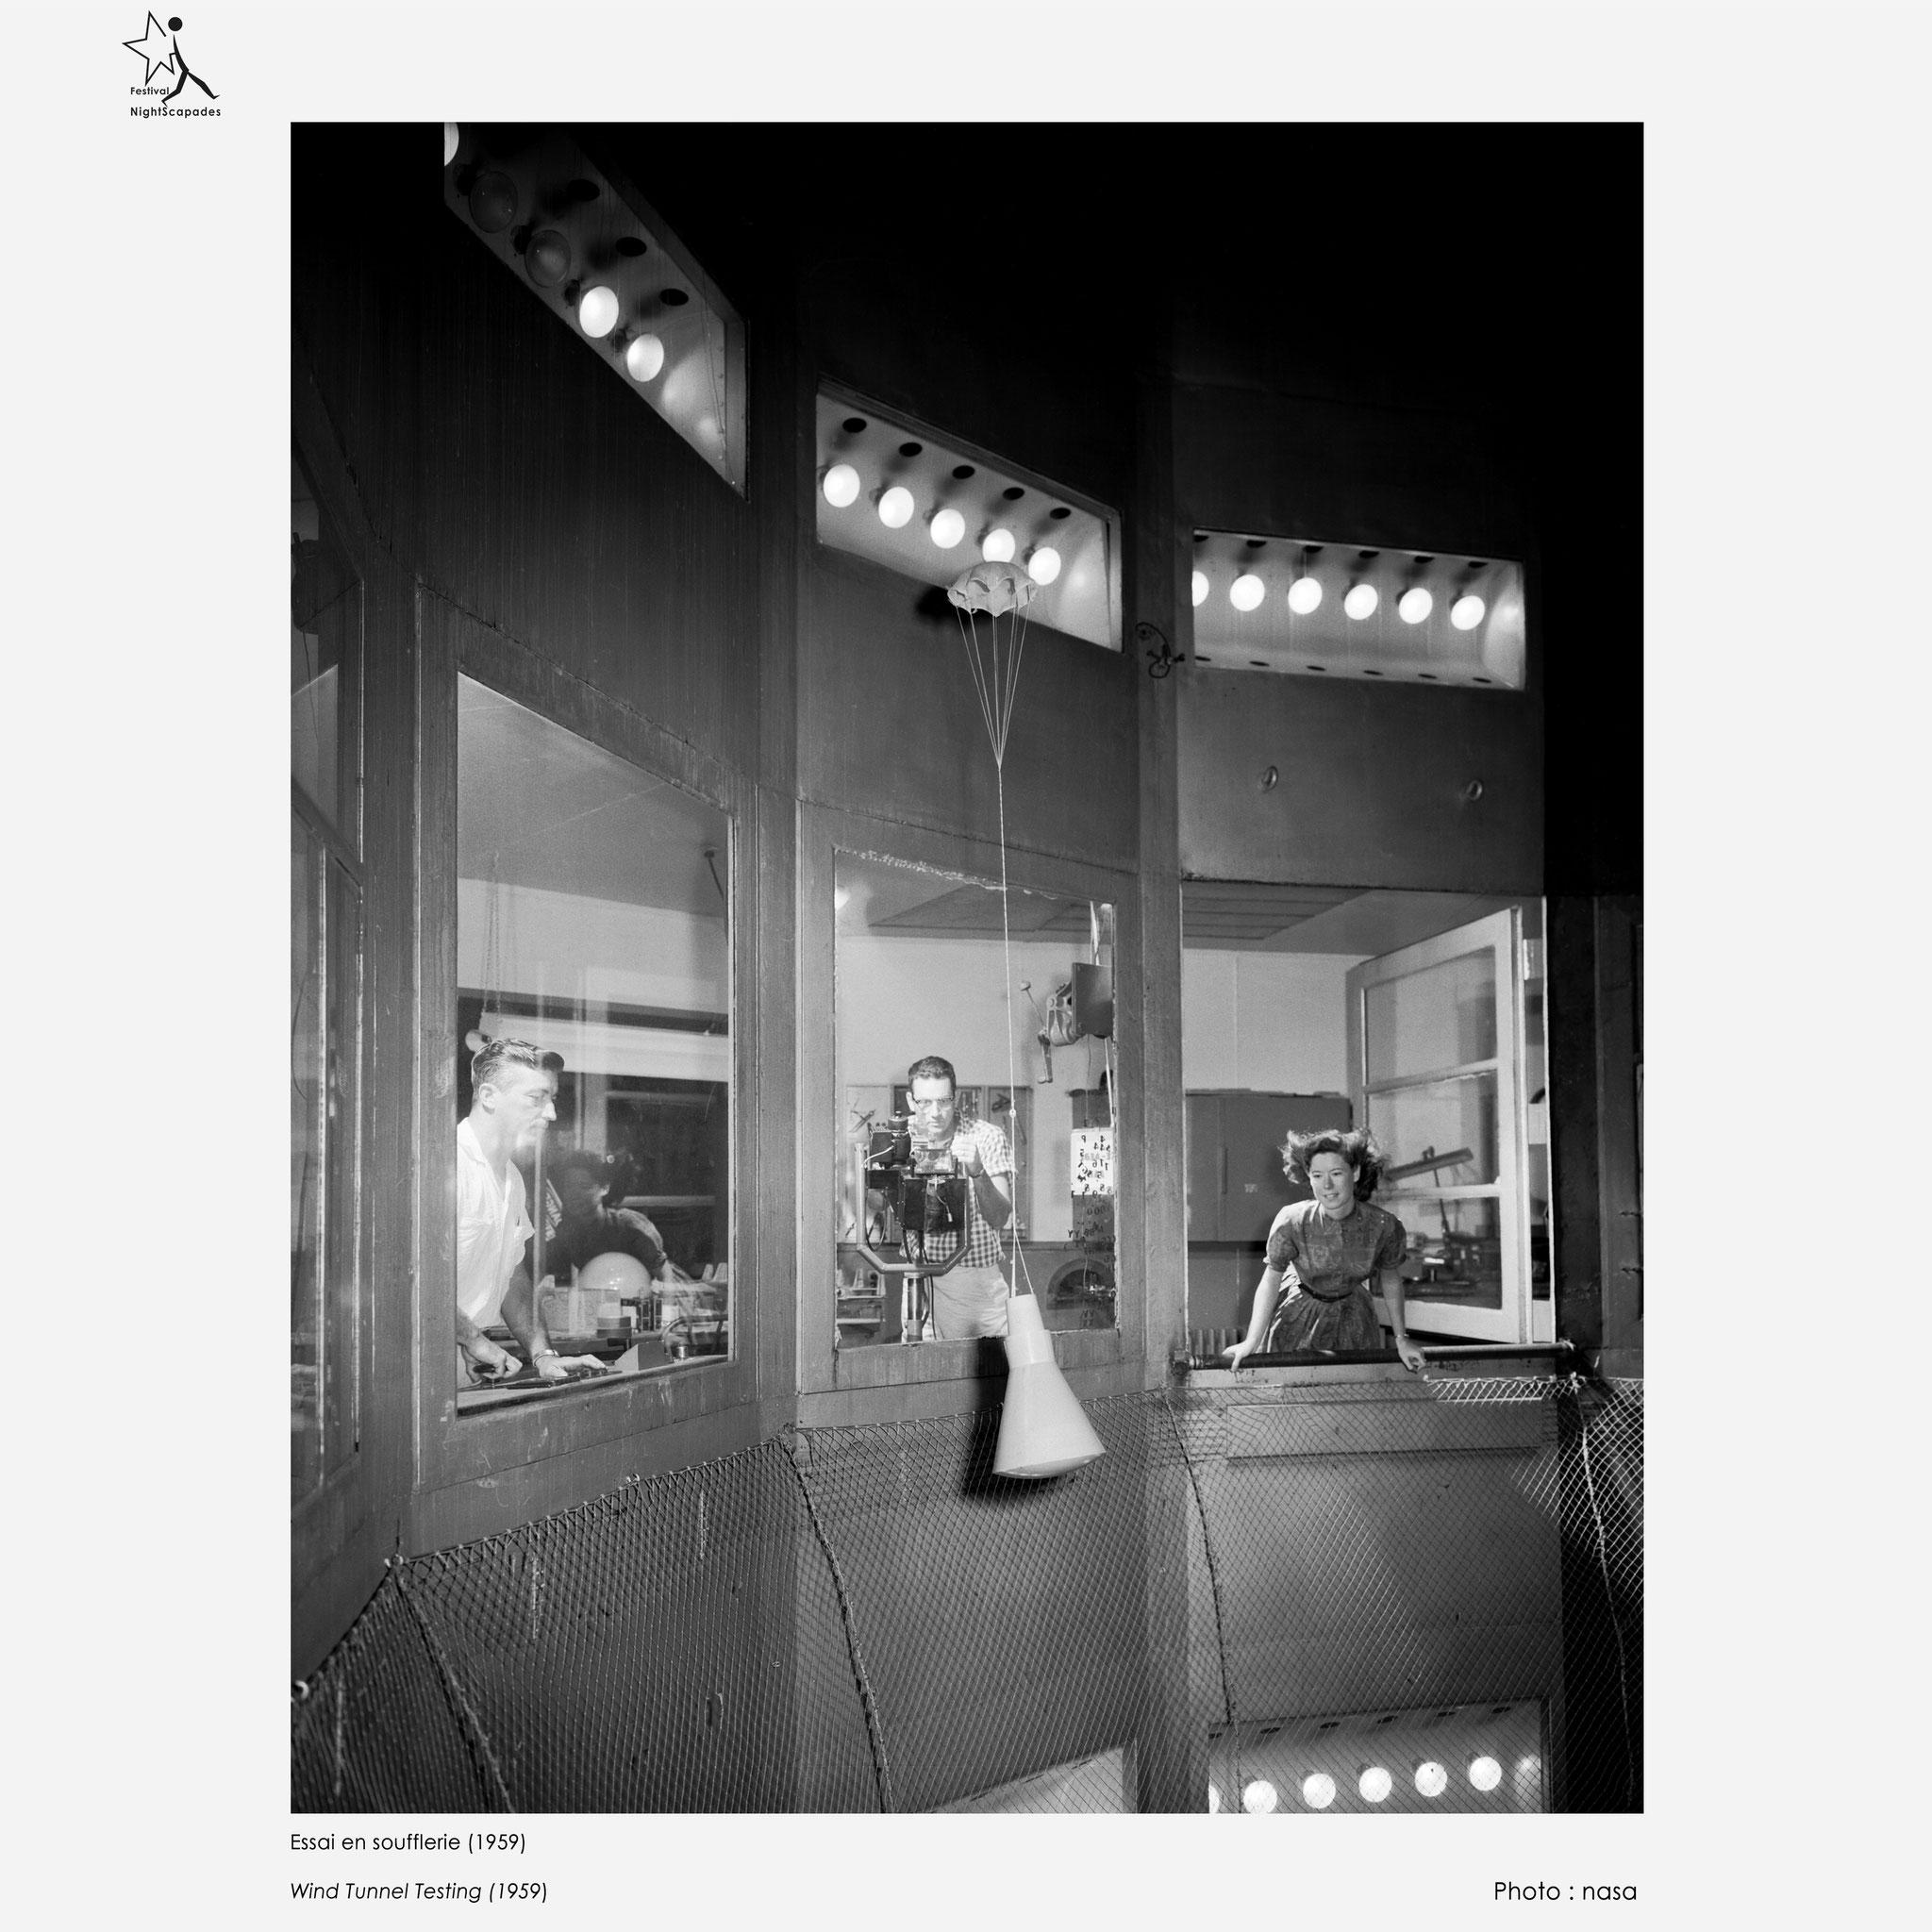 Essai en soufflerie (1959)